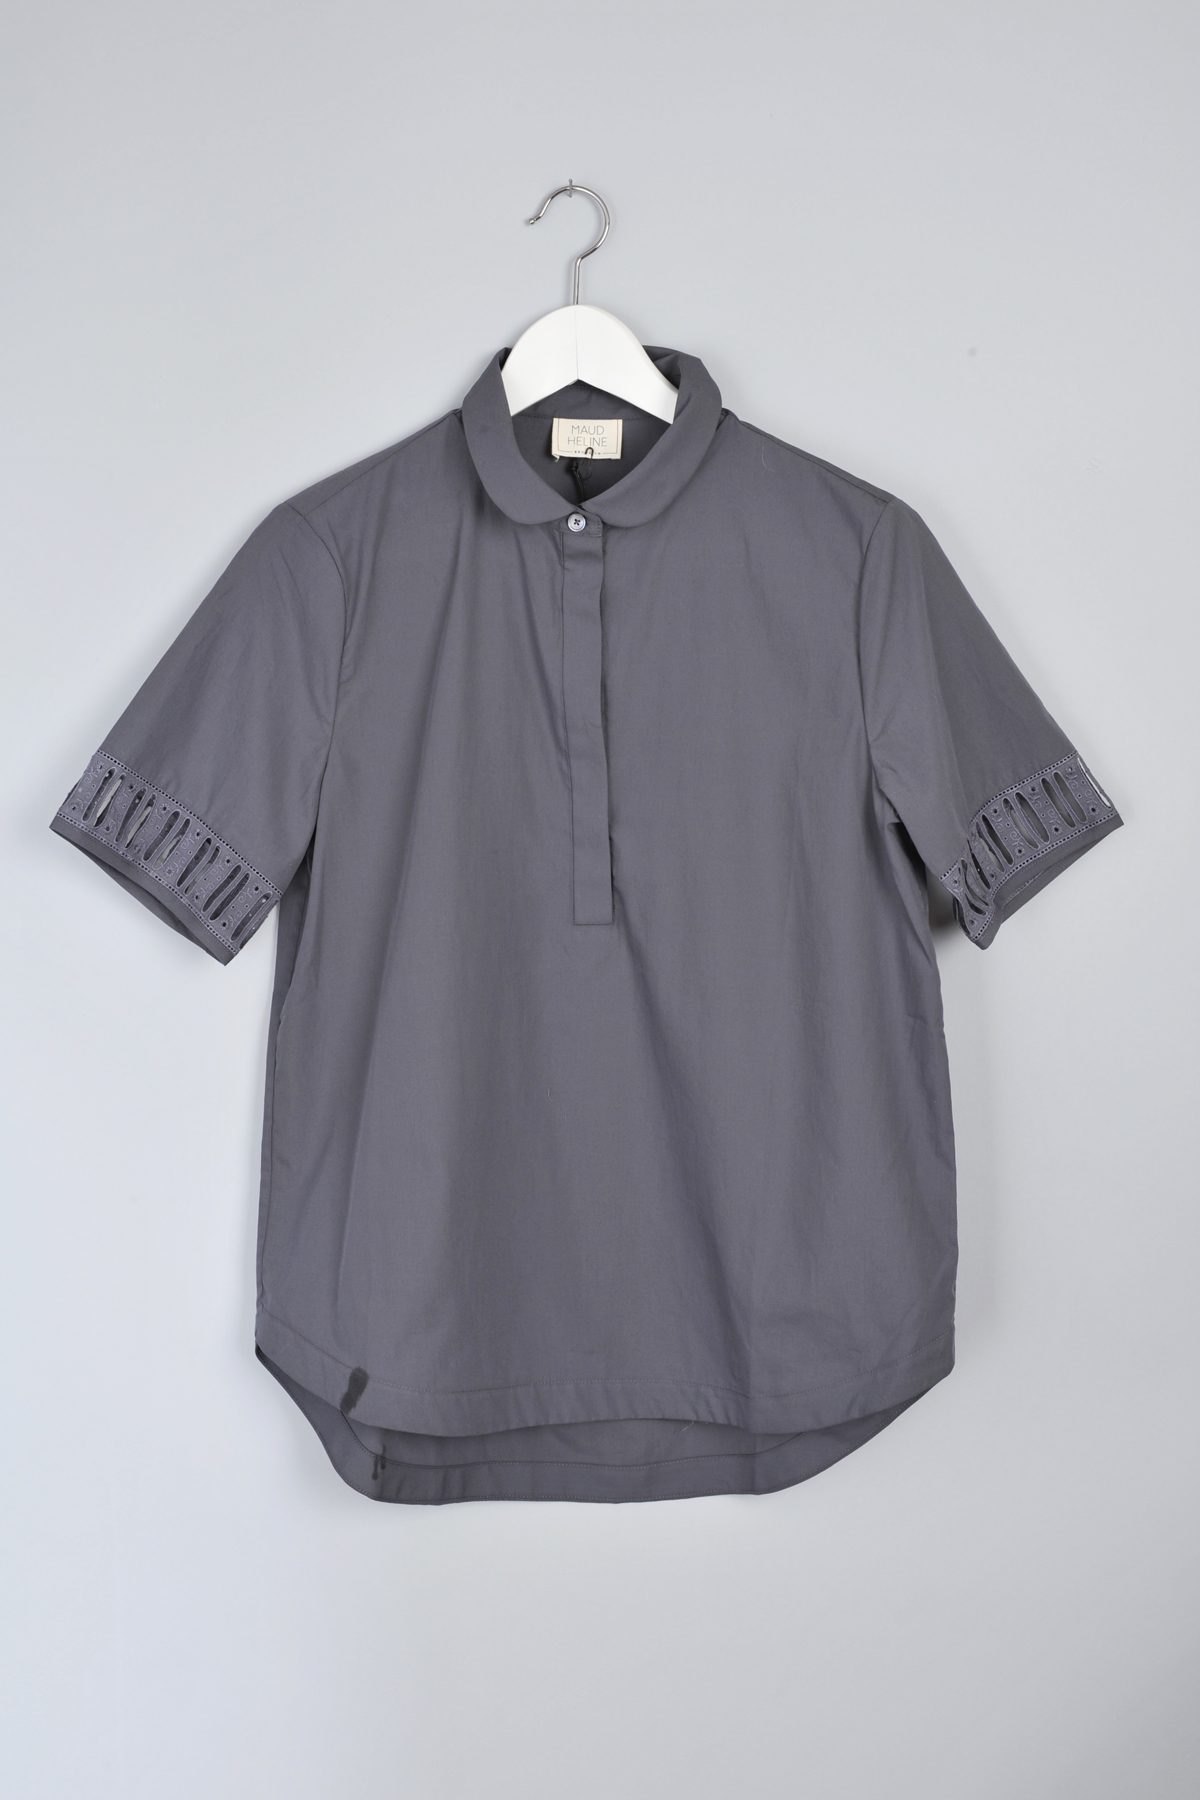 Charcoal Baroze Shirt With Peter Pan Collar By Maud Heline Garmentory